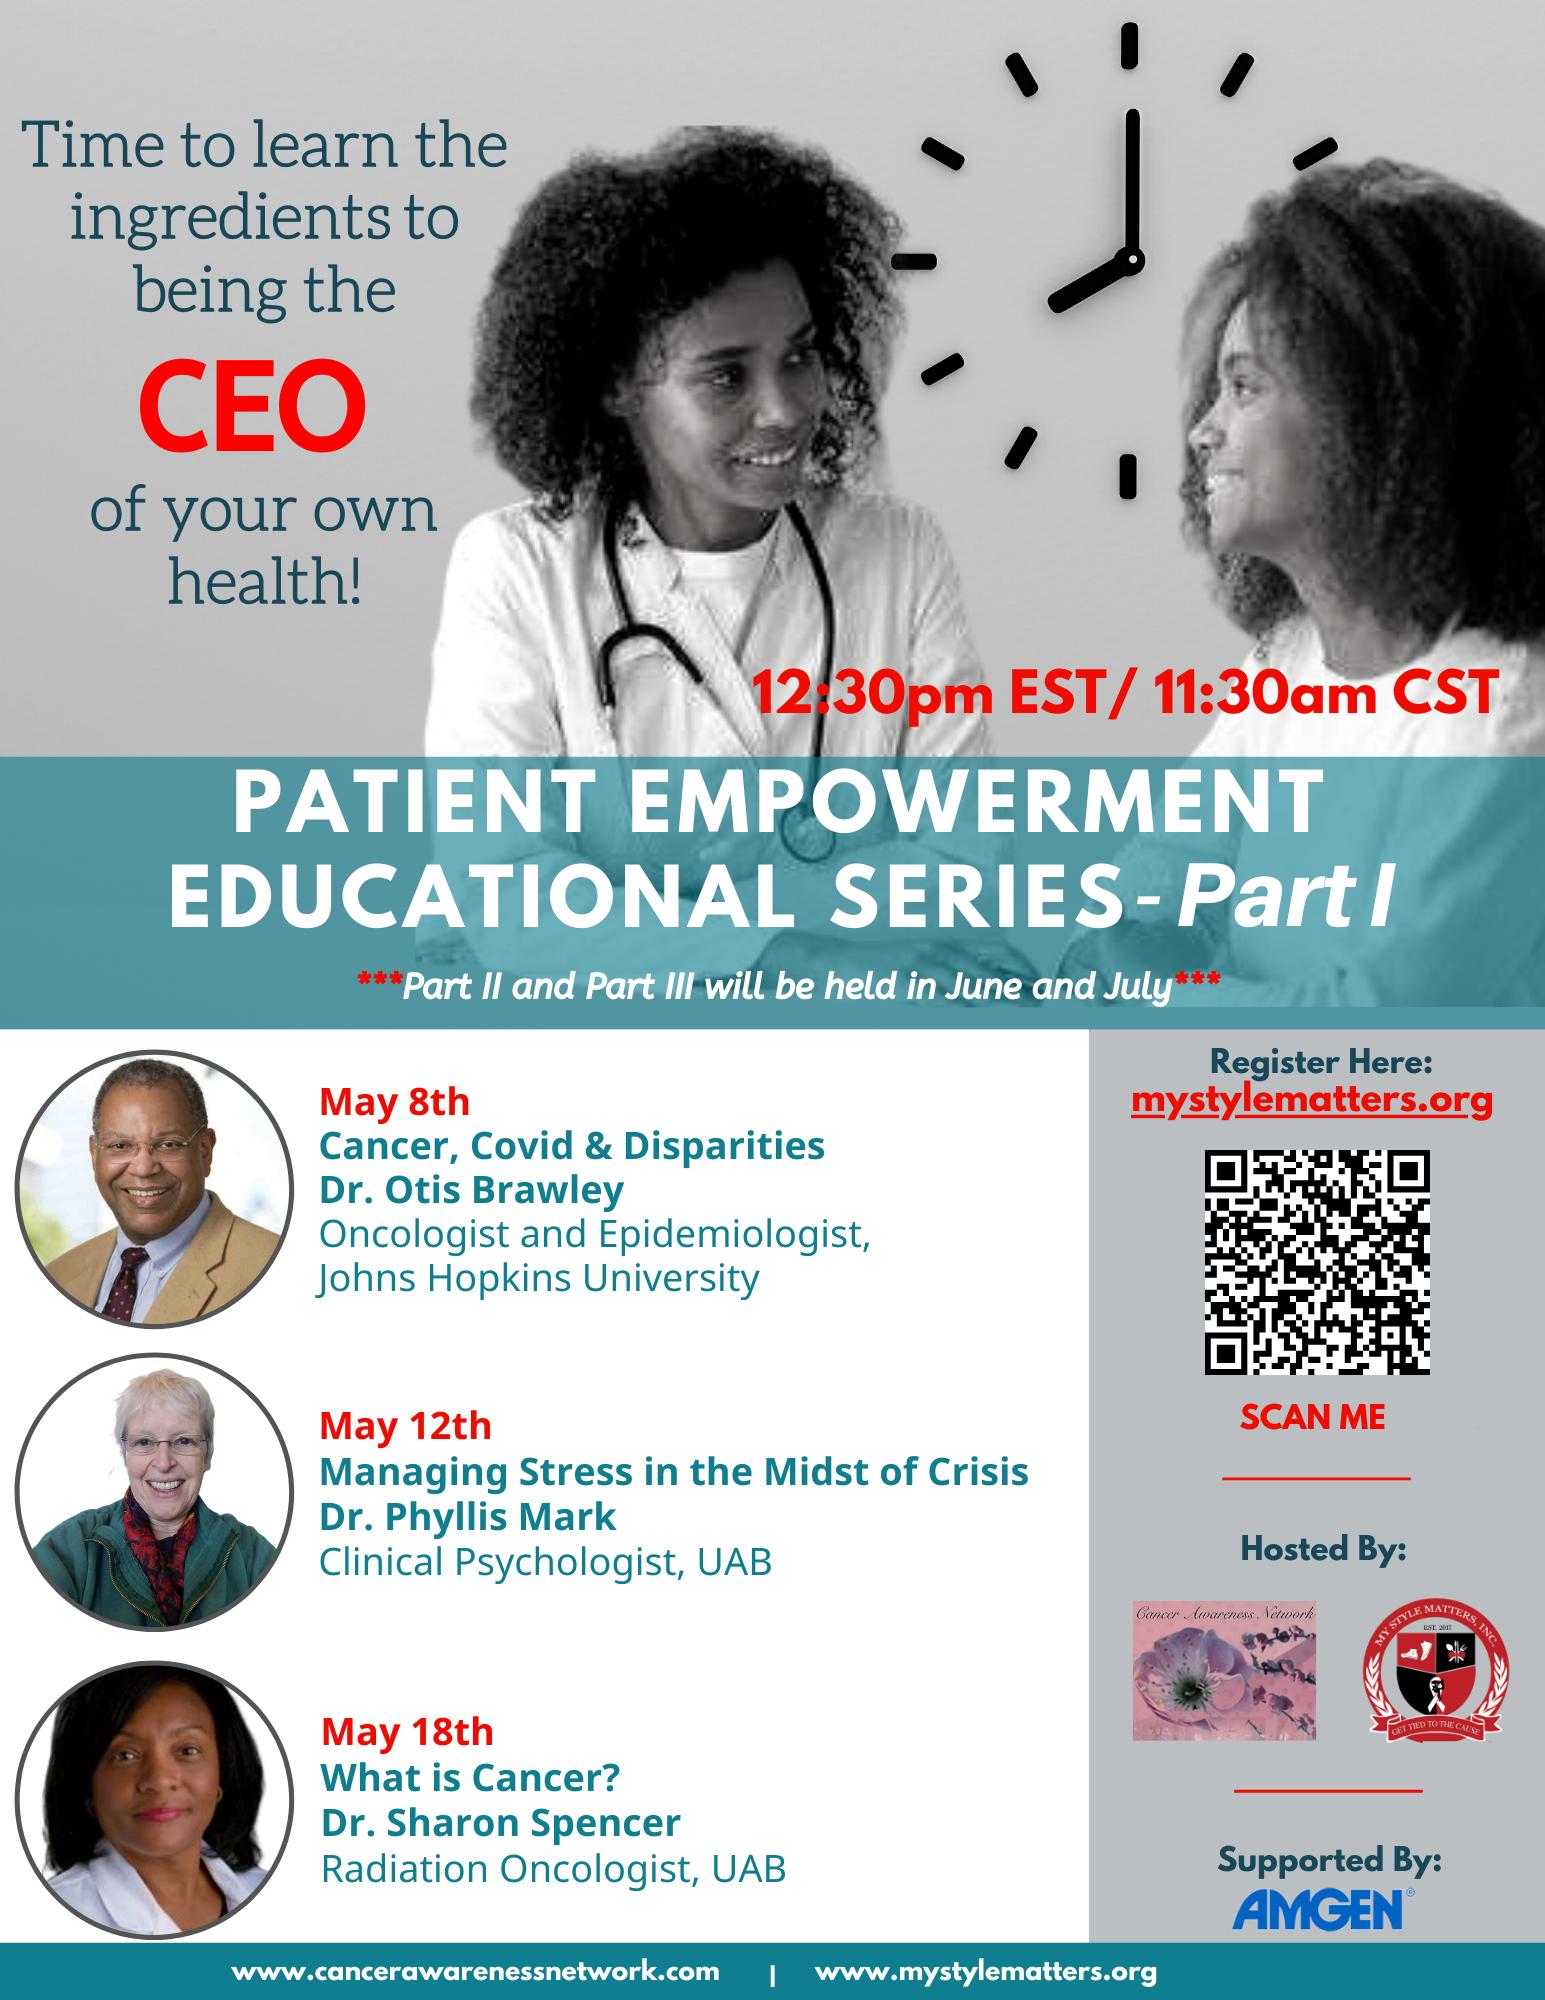 Patient Empowerment Educational Series